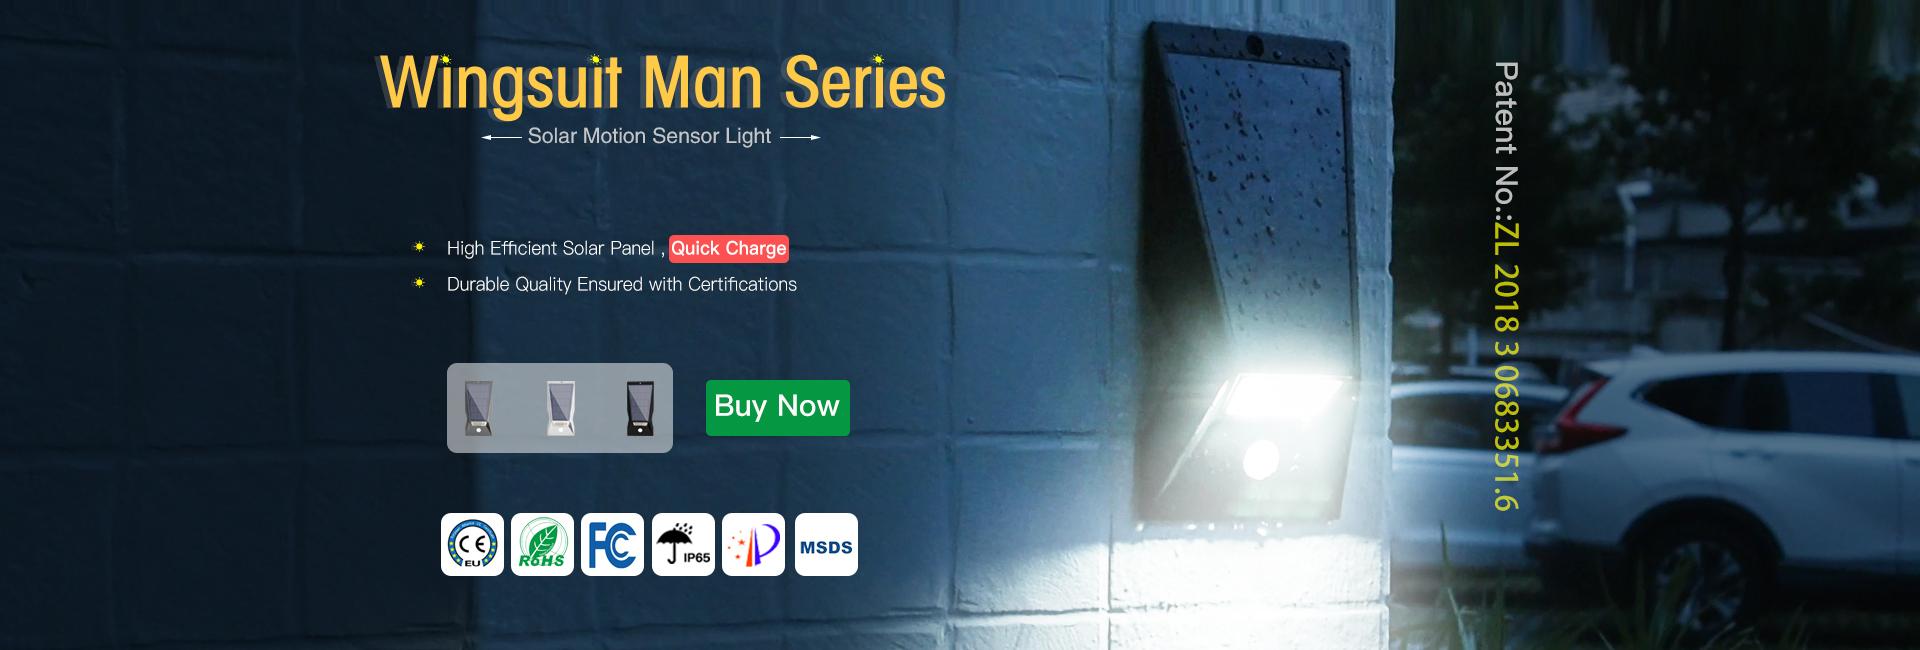 LED Solar Aplik LED Güneş Duvar Işık, LED Sensörü Duvar Işık, Akıllı LED Solar, İndüktif Duvar Işık, güneş kapı led ışık, güneş ışığı açık, hareket sensörü güneş ışığı, güneş acil ışık, güneş bahçe duvarı ışık led